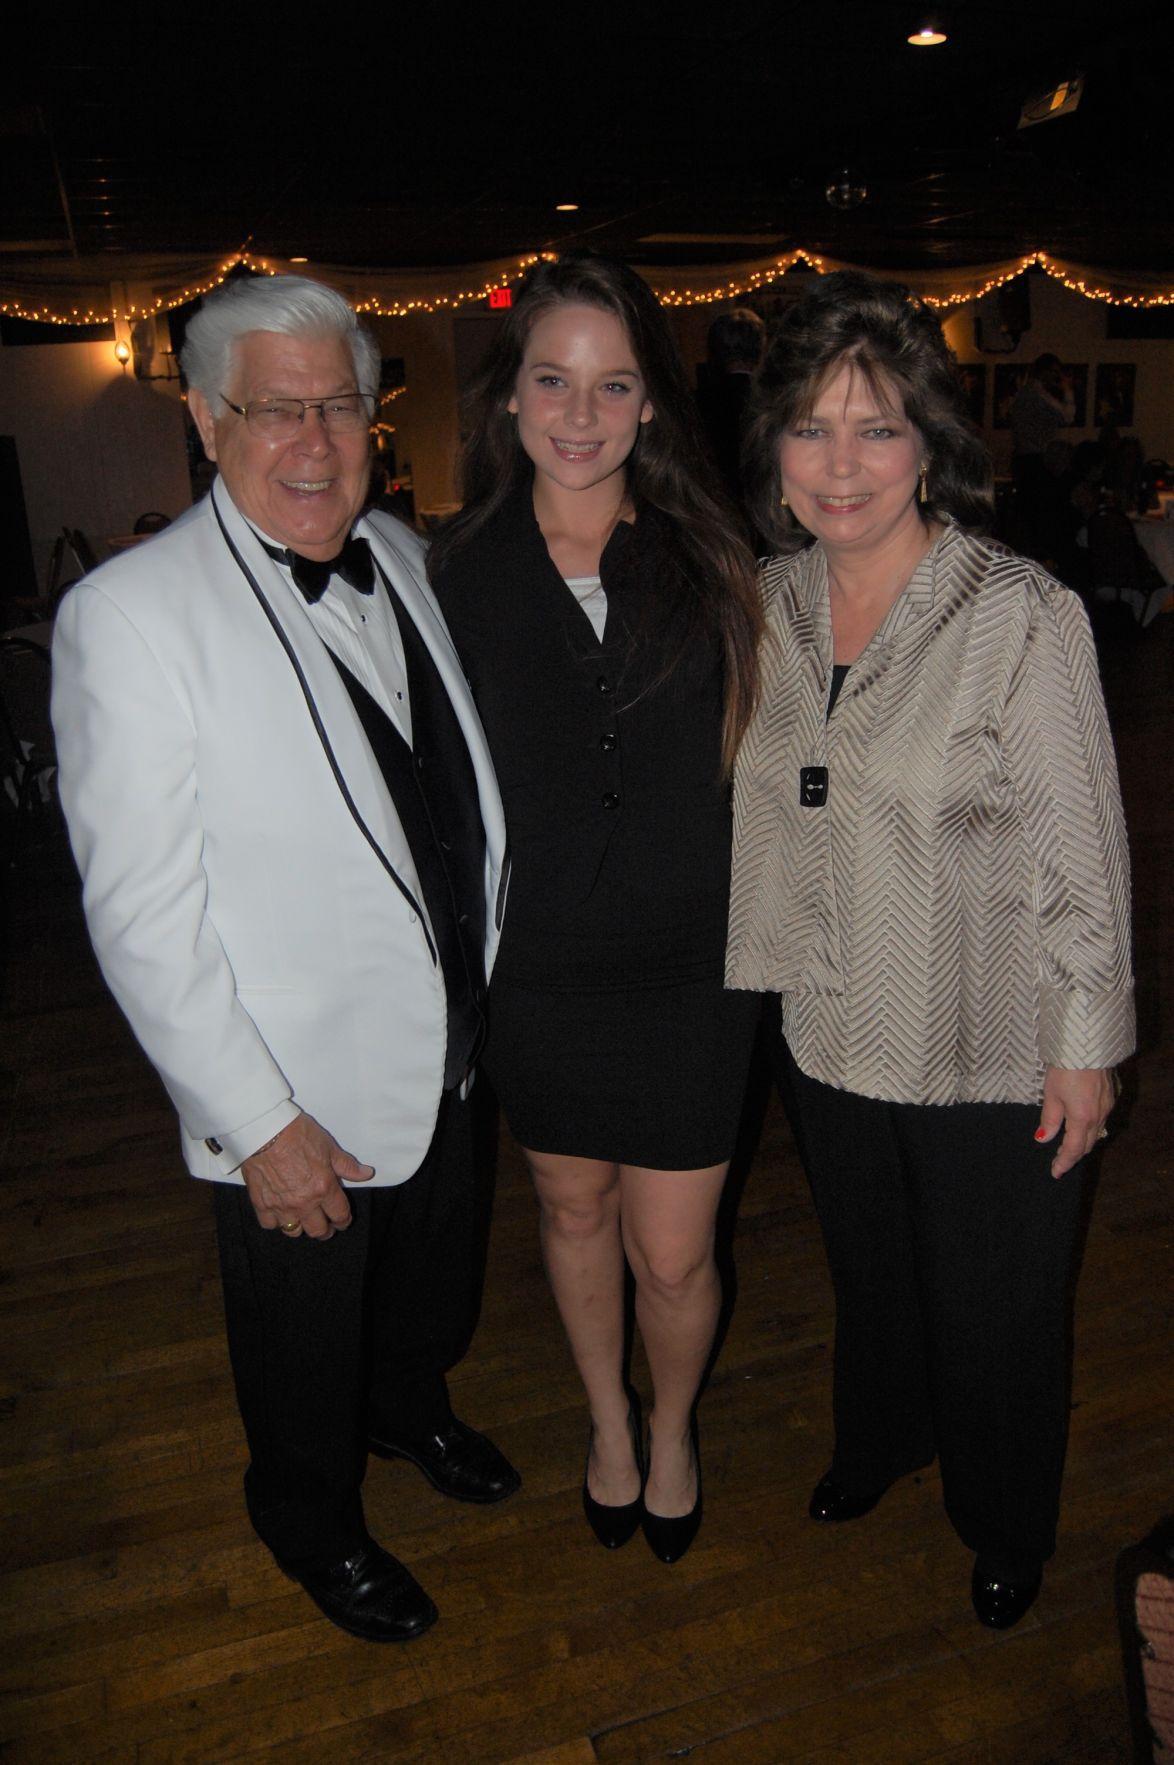 Paul Segobiano, Nikki Nelson, Liz Skinner